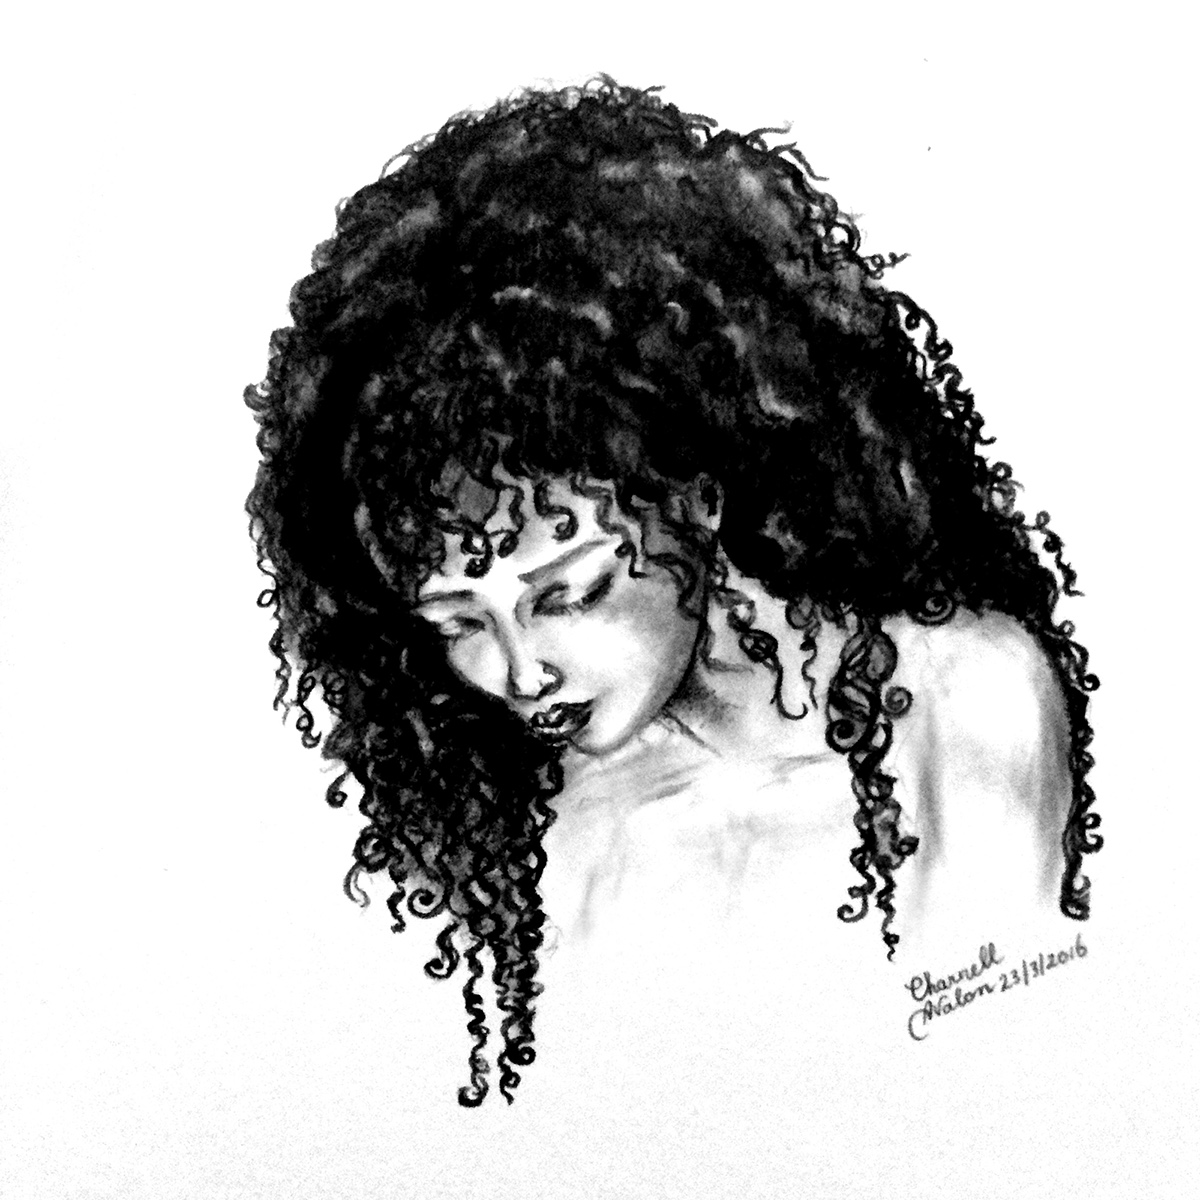 Charnell Illustrations avatar